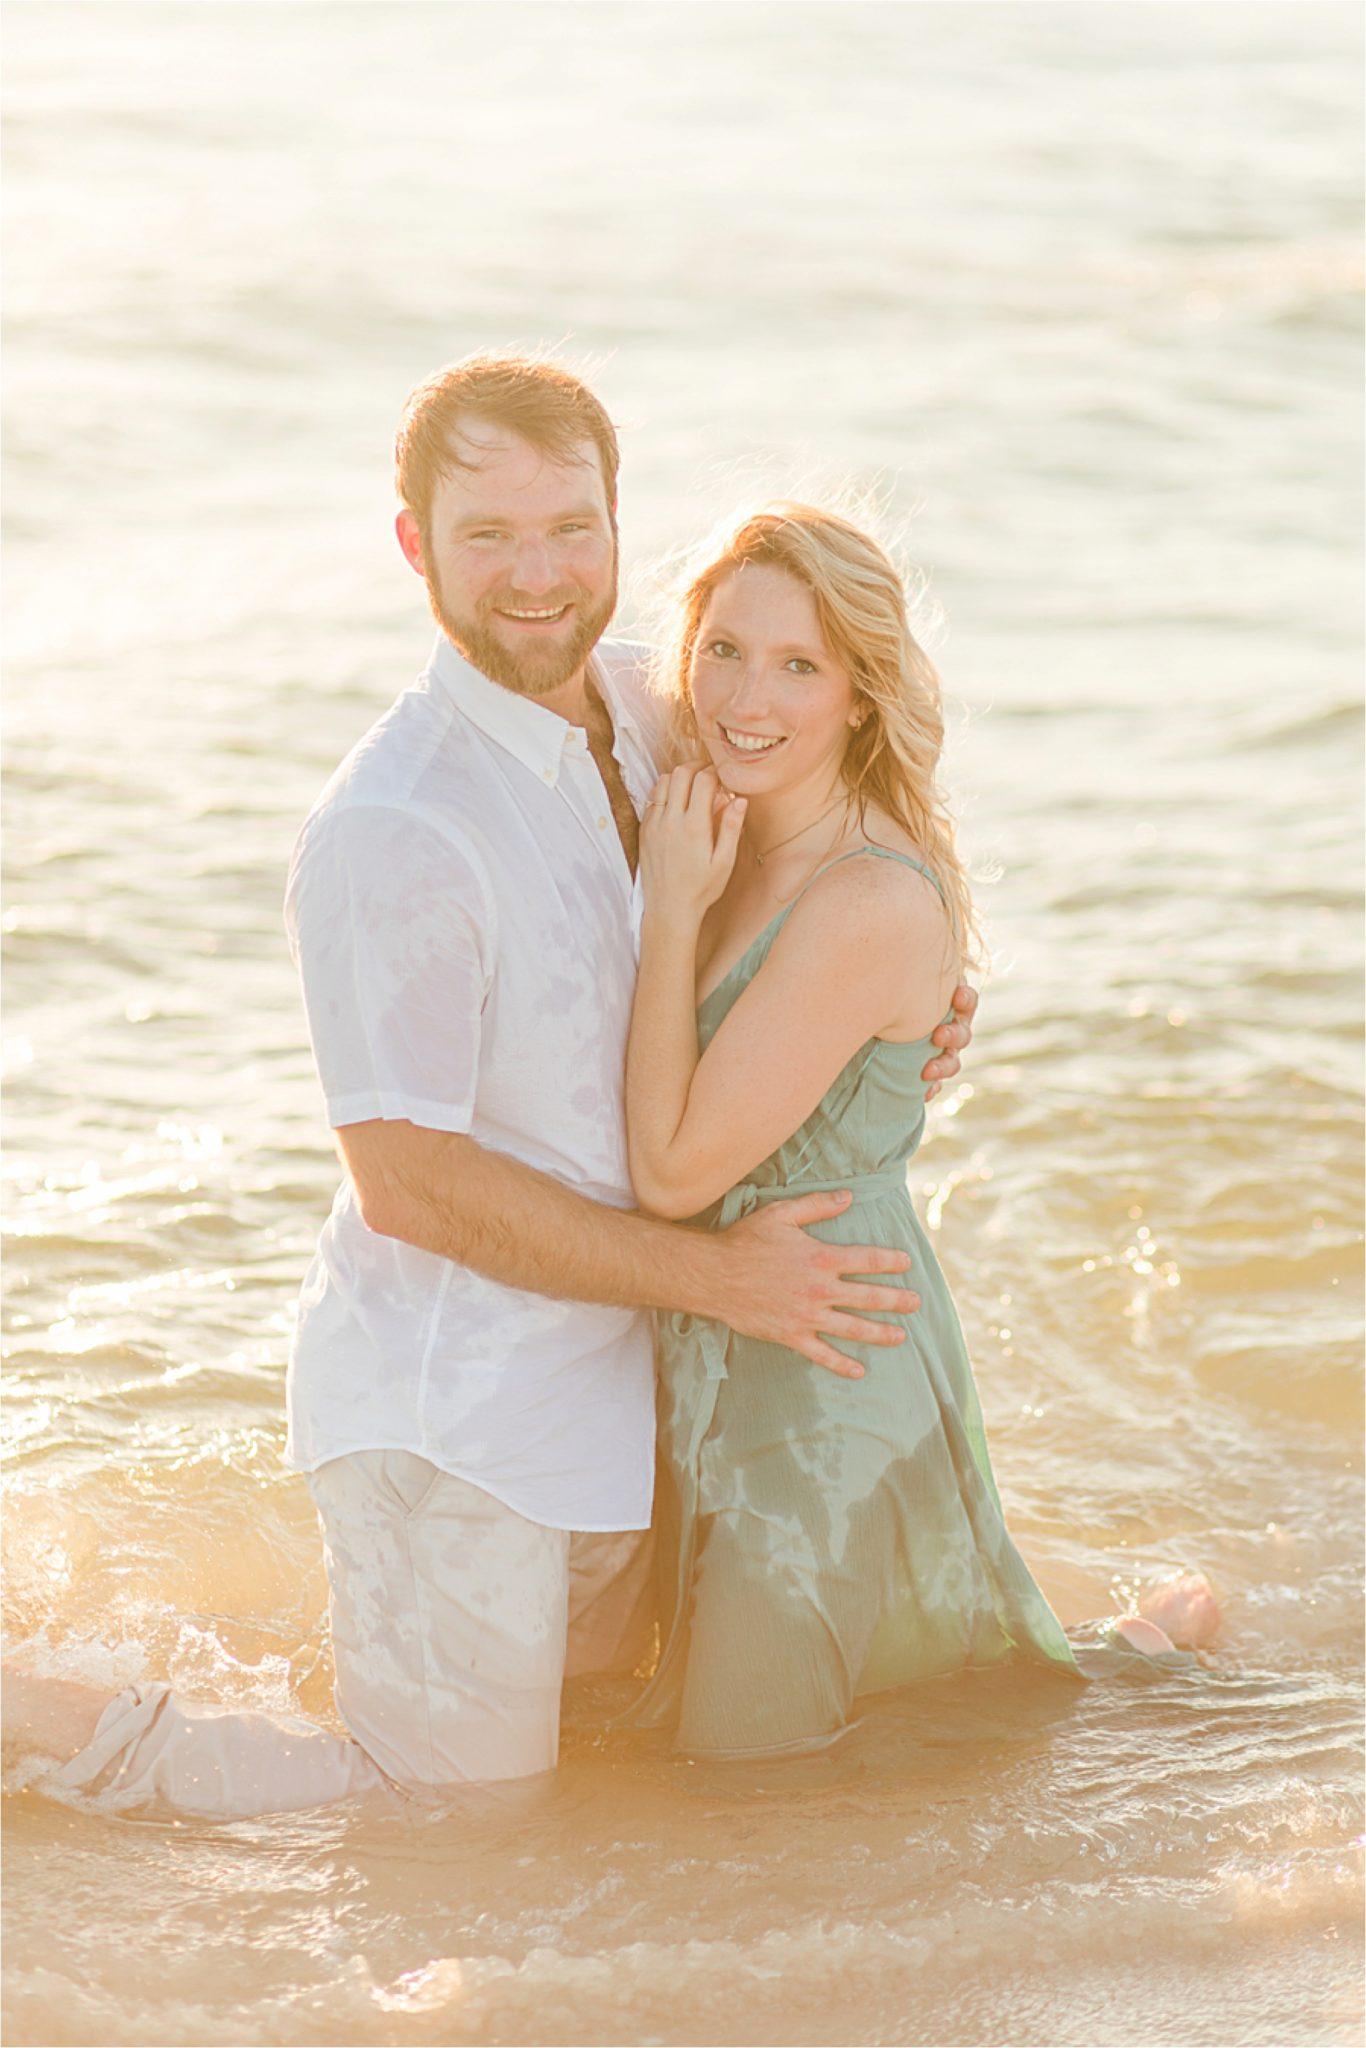 Beach engagement photos, Daulphin Island, Mobile wedding photographer, Candid couples, Romantic engagement shoot inspiration, whimsical, sunset engagement shoot